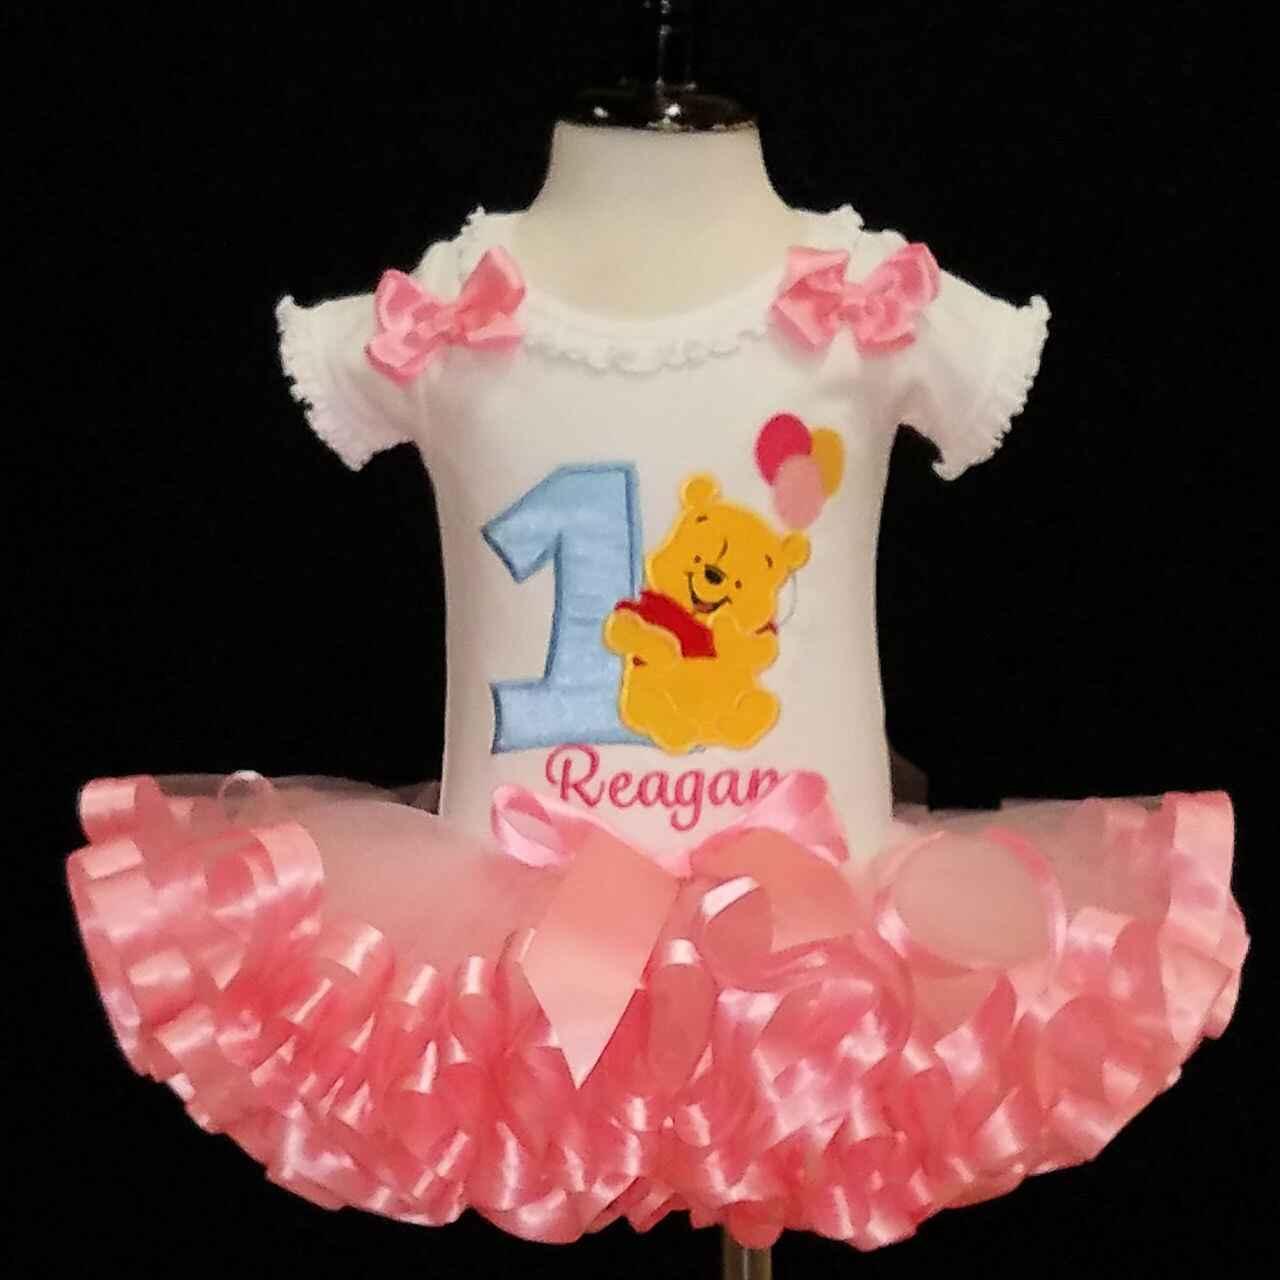 girls-outfits/winnie-the-pooh-birthday-girl-outfit-pooh-bear-birthday-outfit-1st-birthday-outfit-personalized-cake-smash-birthda